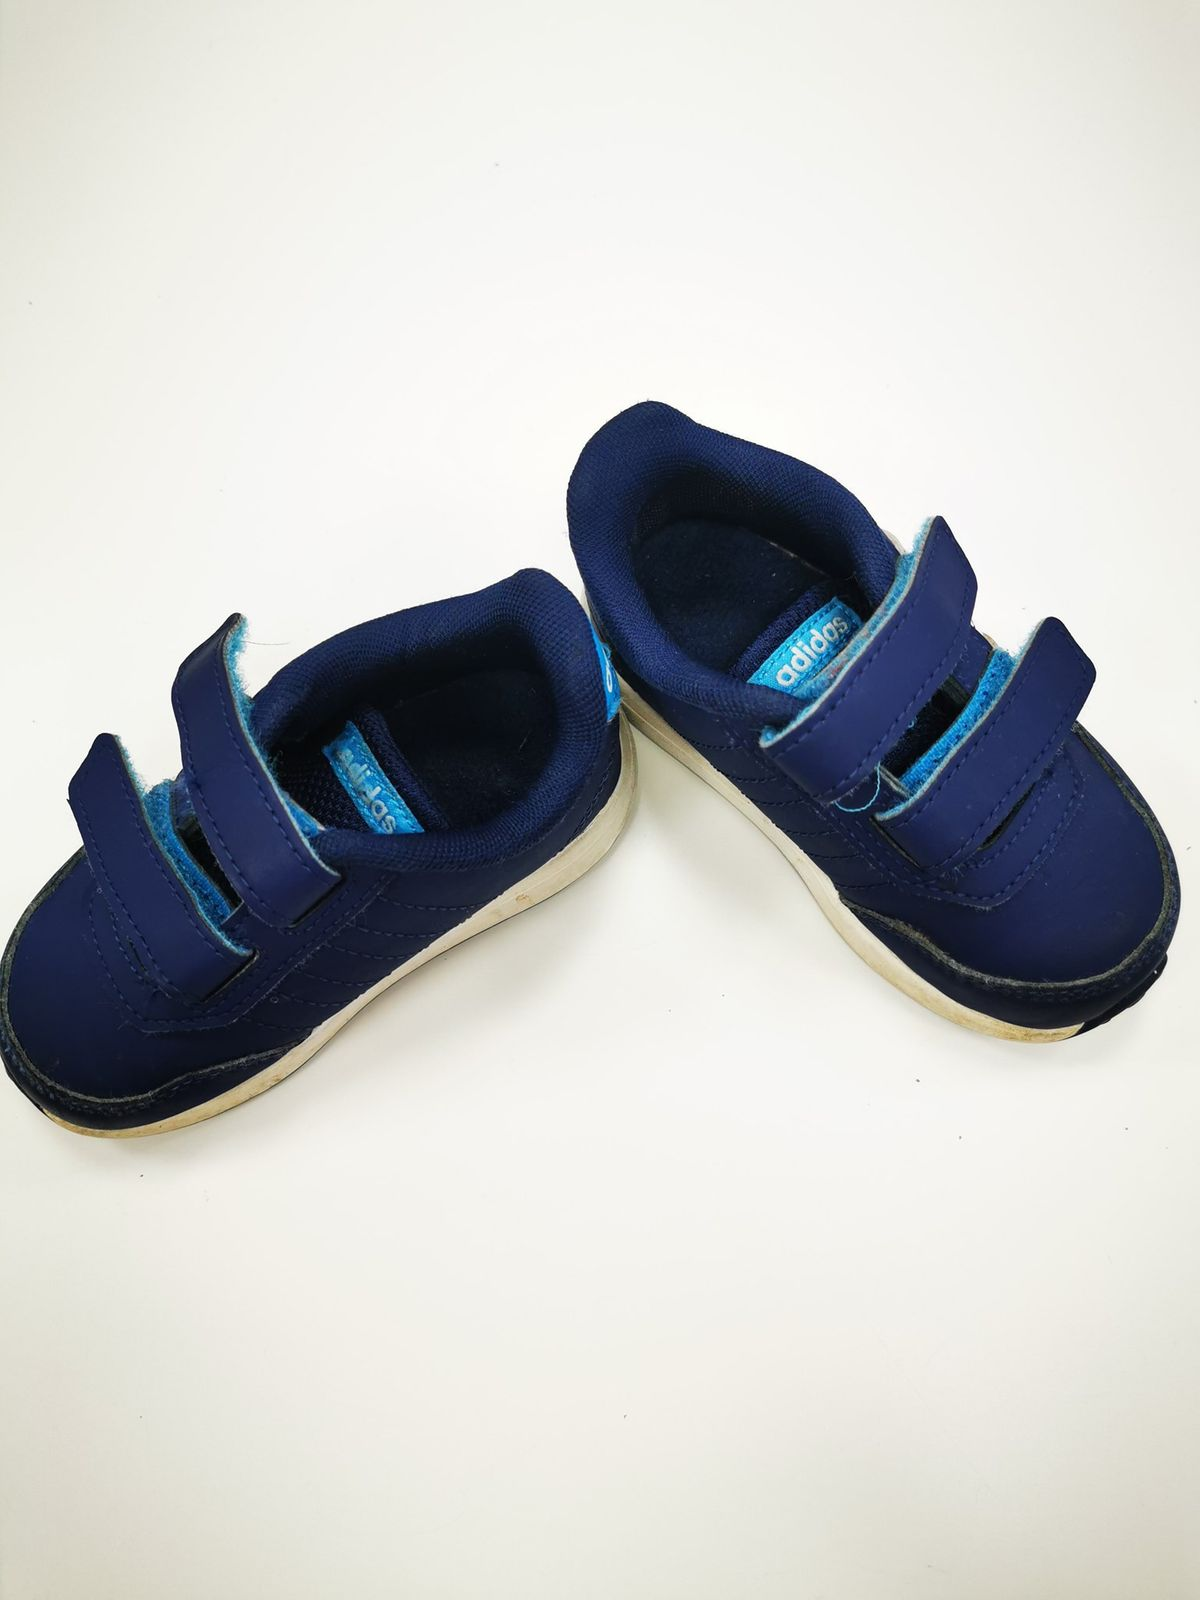 Adidas n 22 Invernali € 13.00 9805